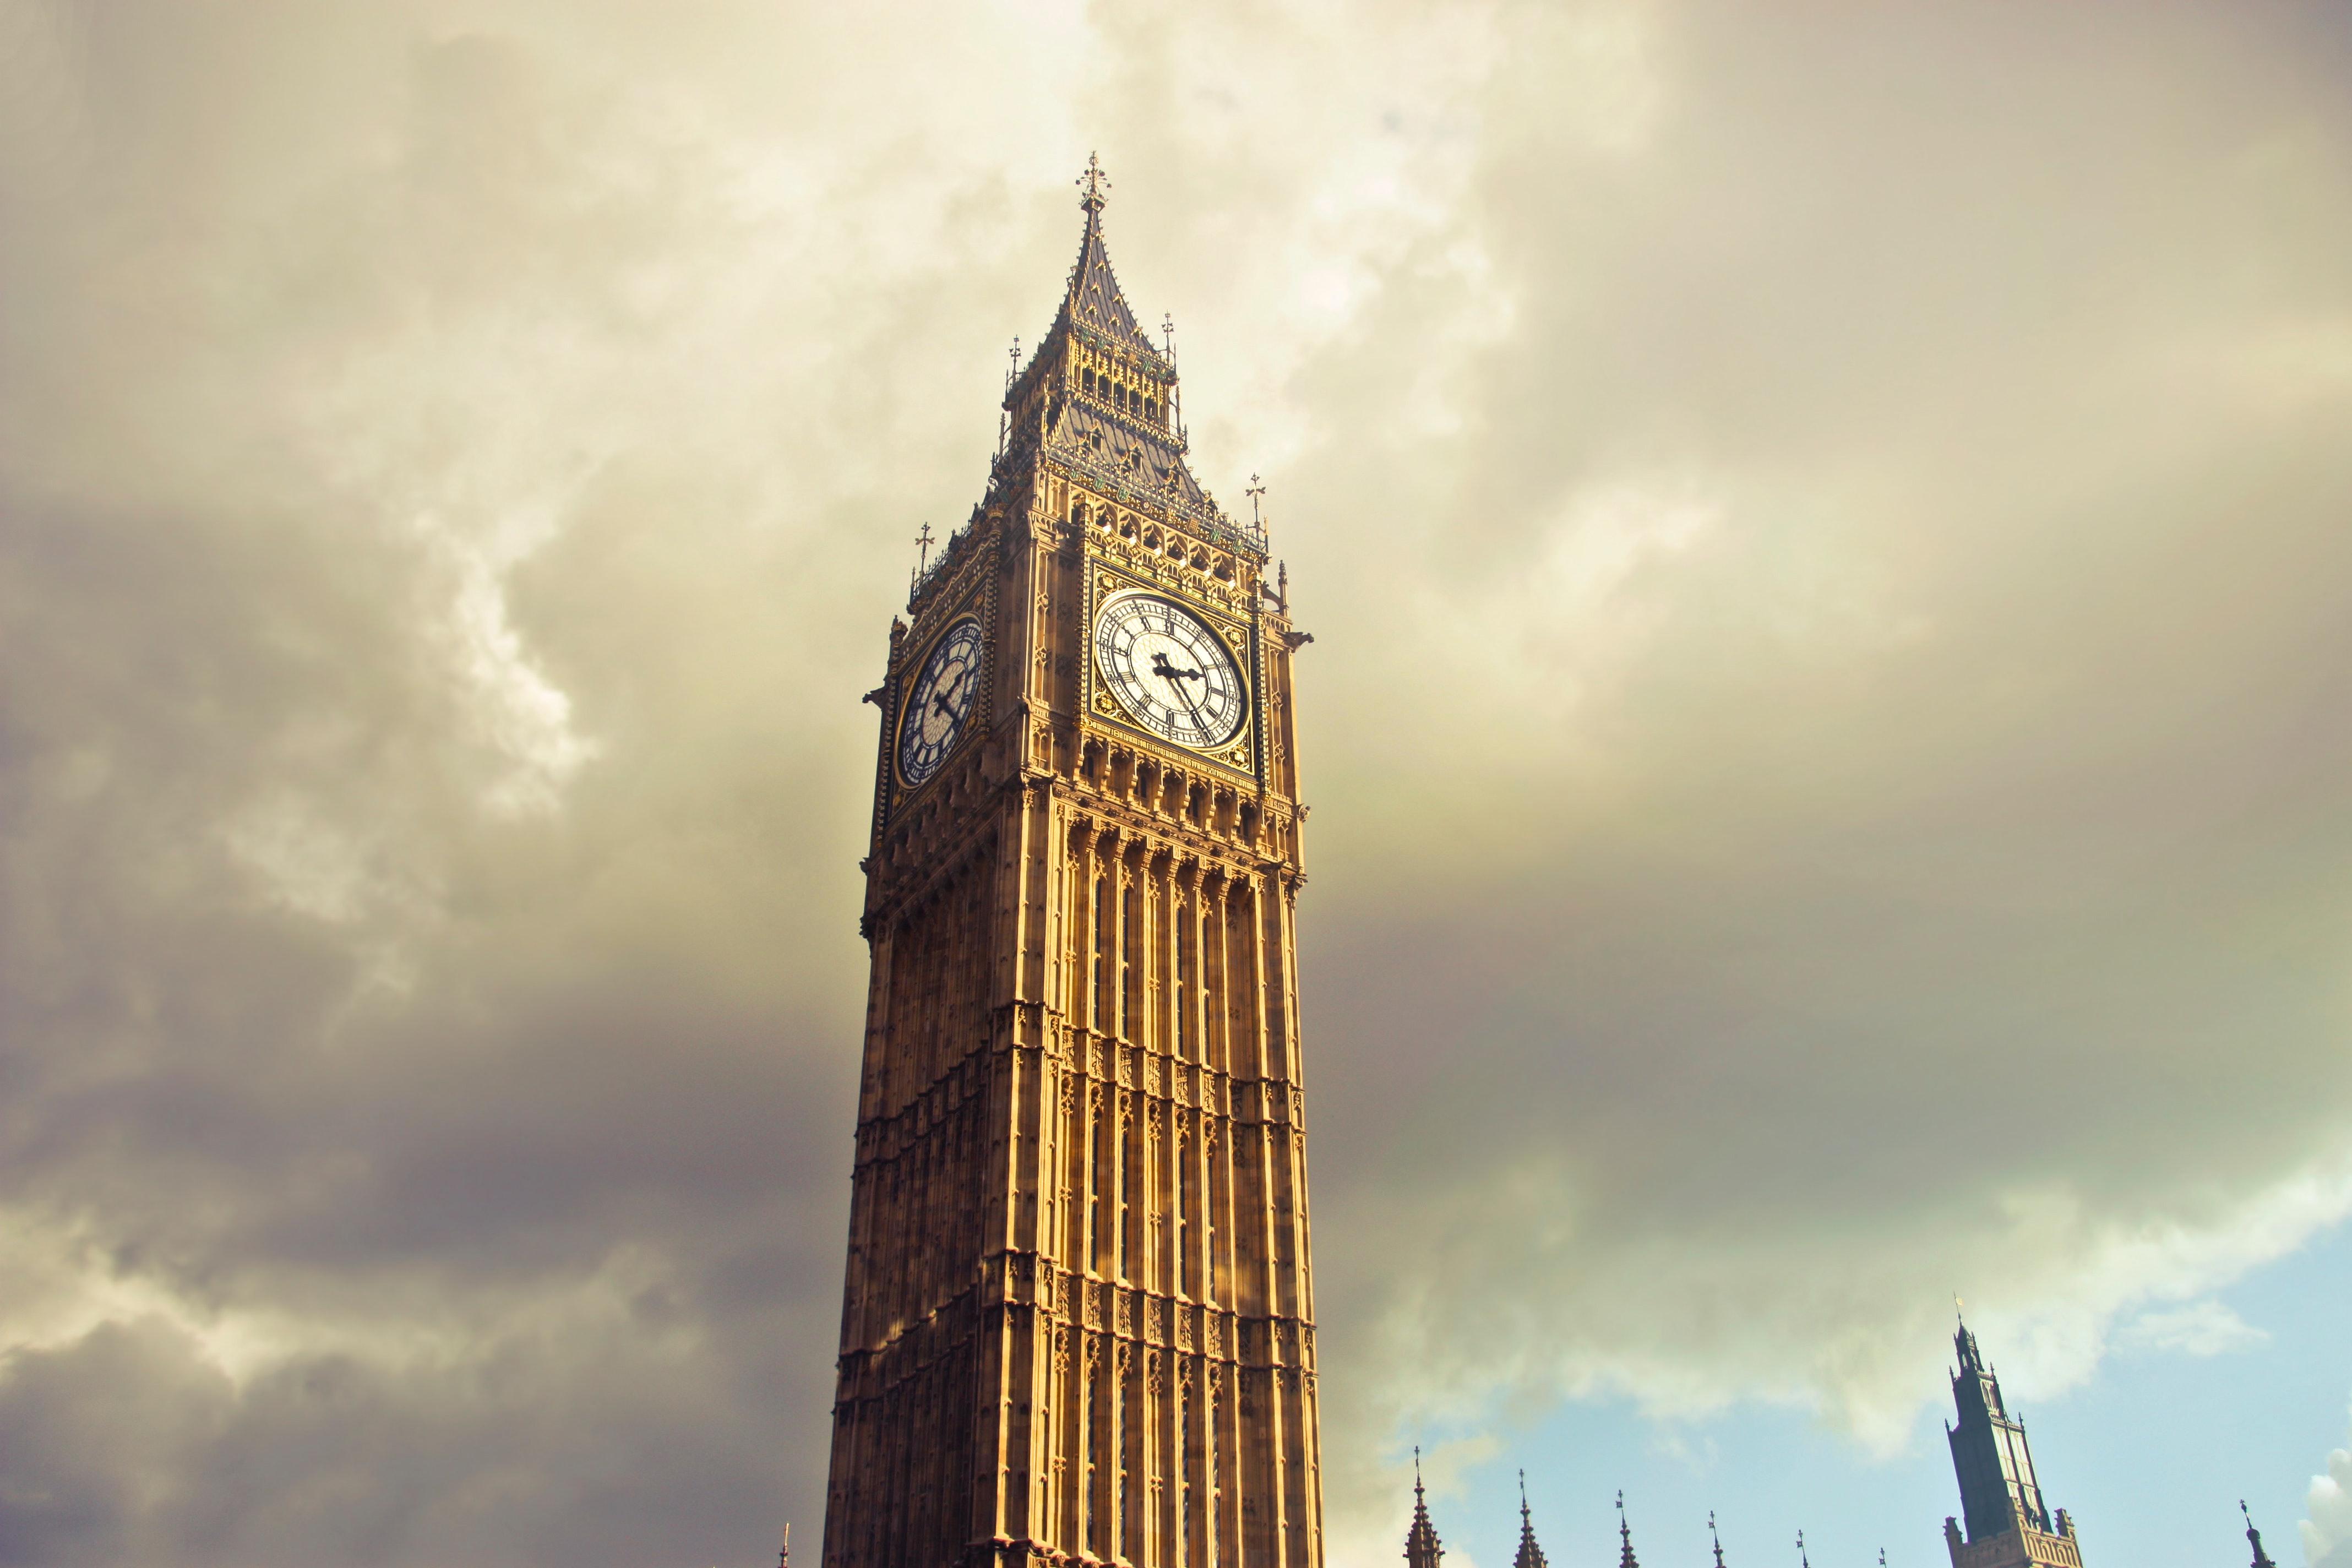 Queen Elizabeth Tower, London, Architecture, London, United kingdom, Tower, HQ Photo